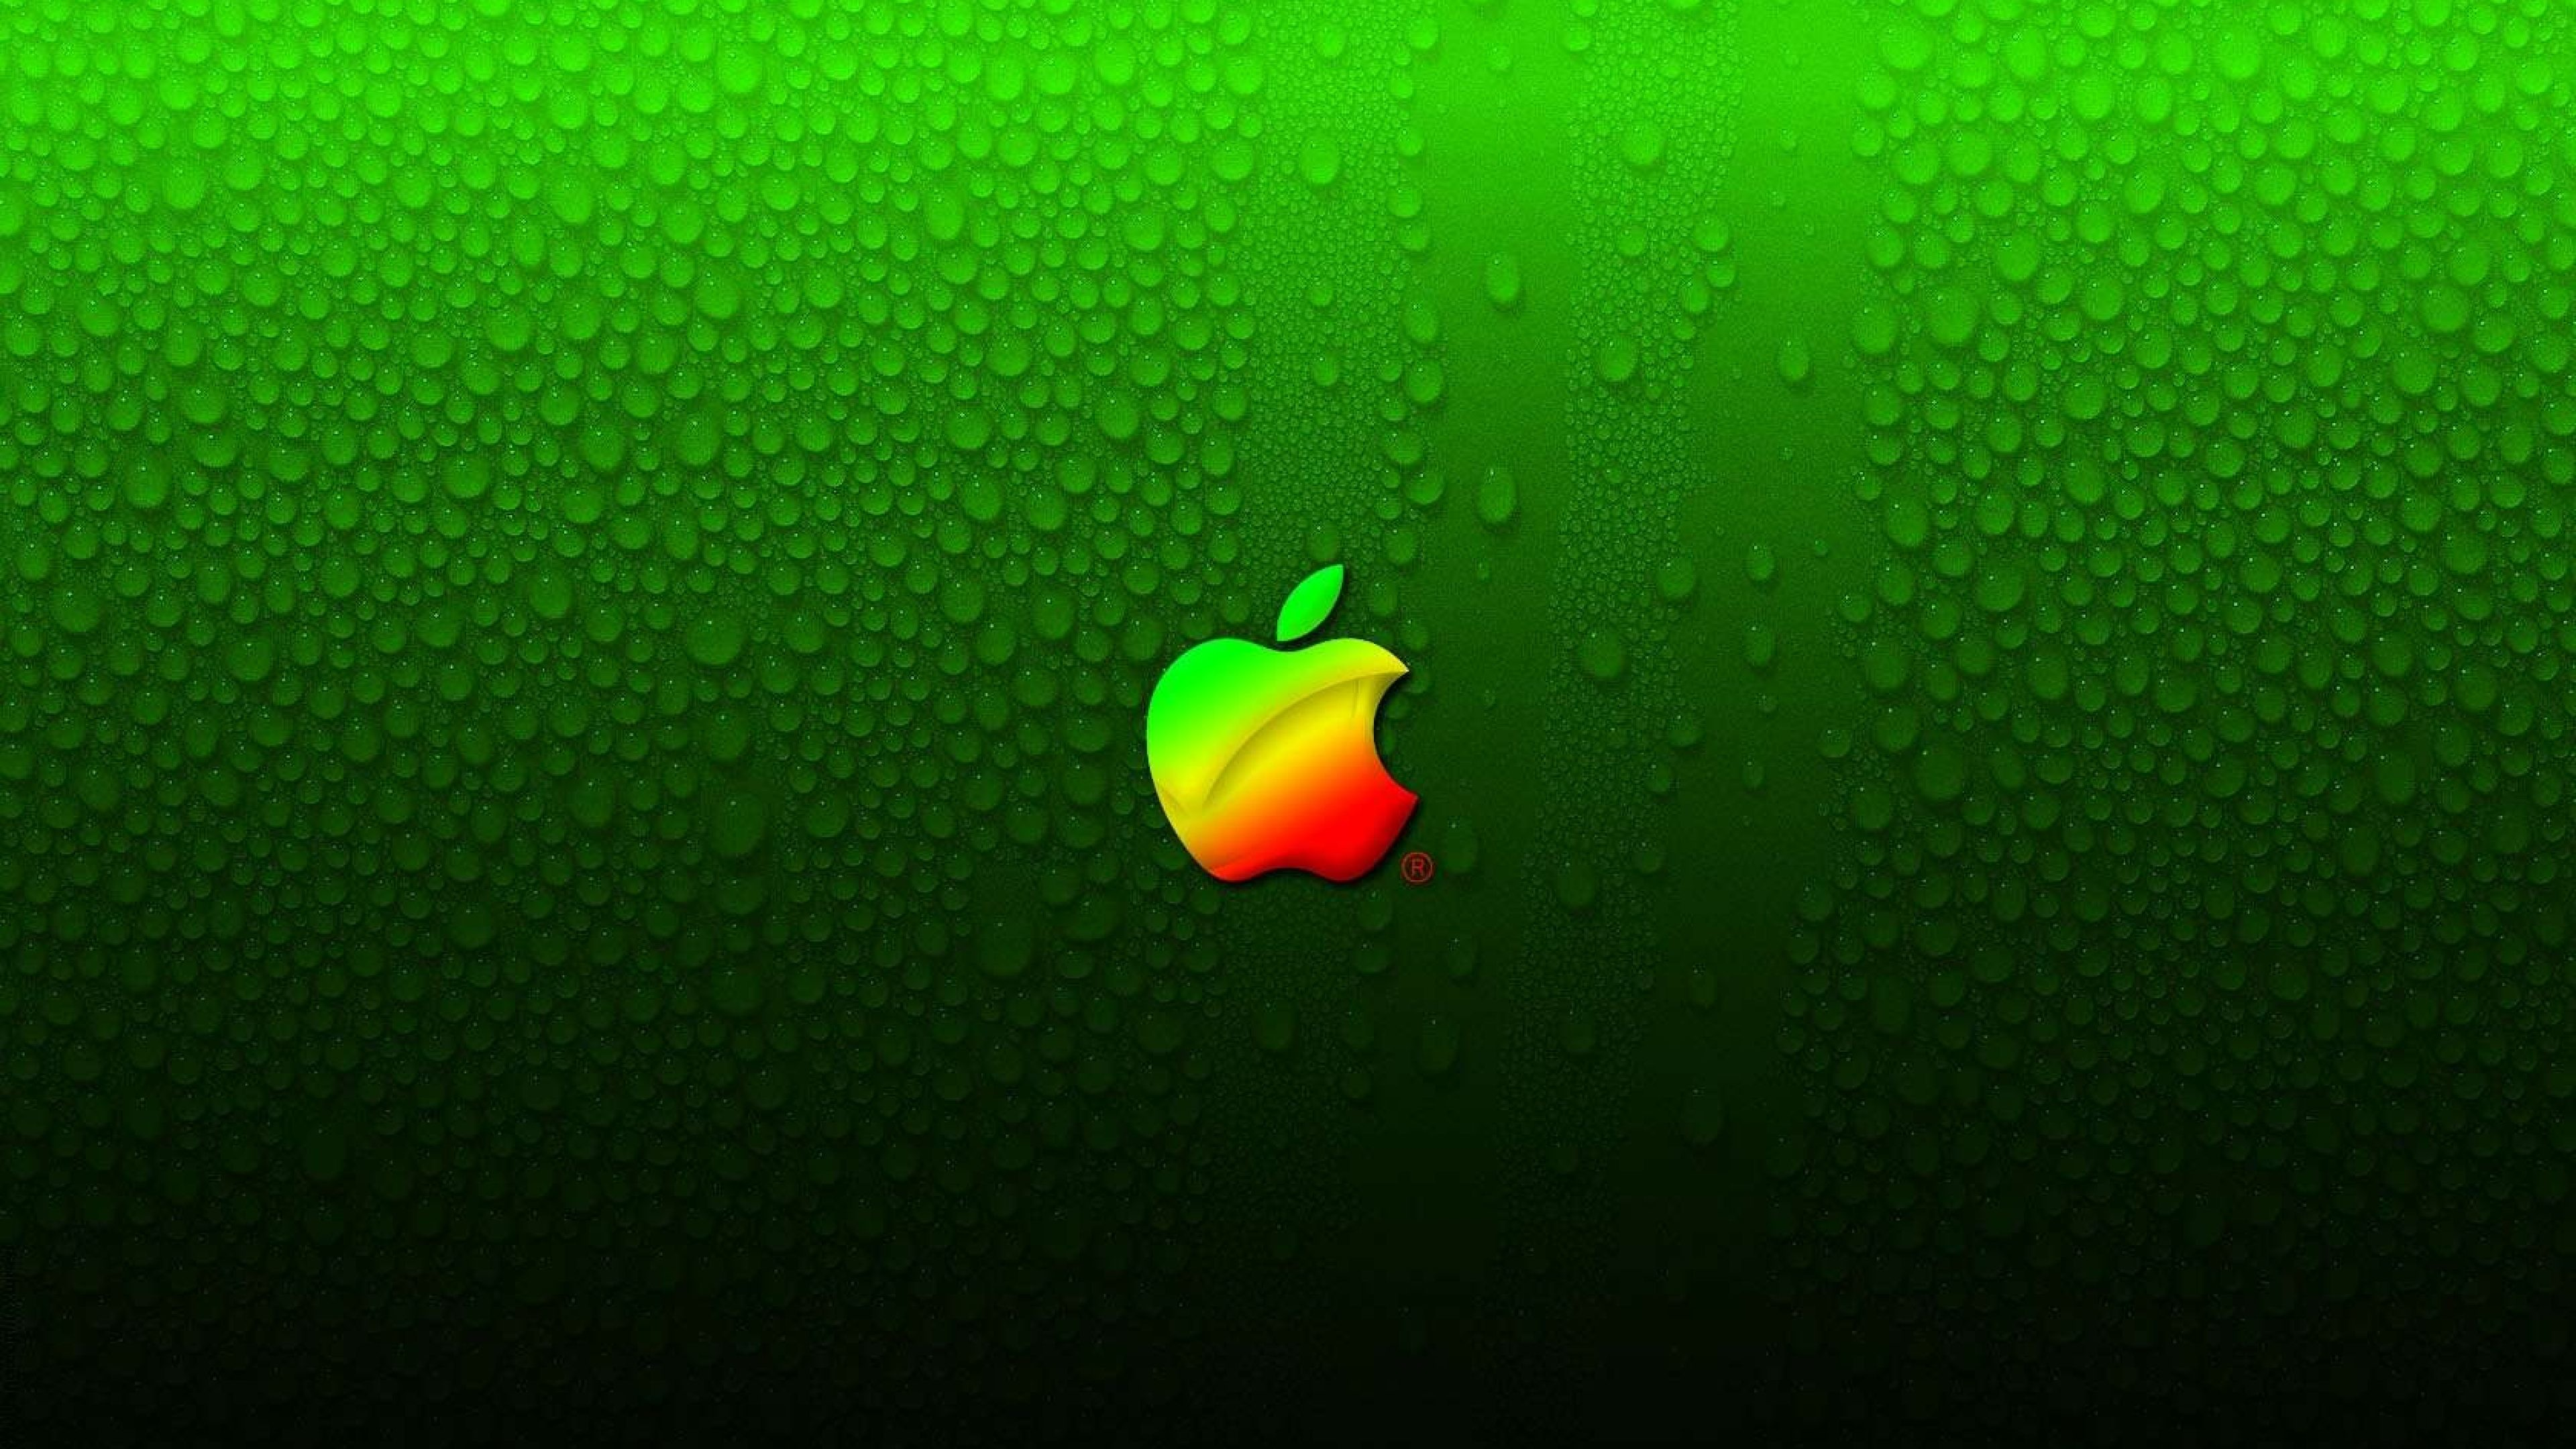 Best Mac Desktop Background